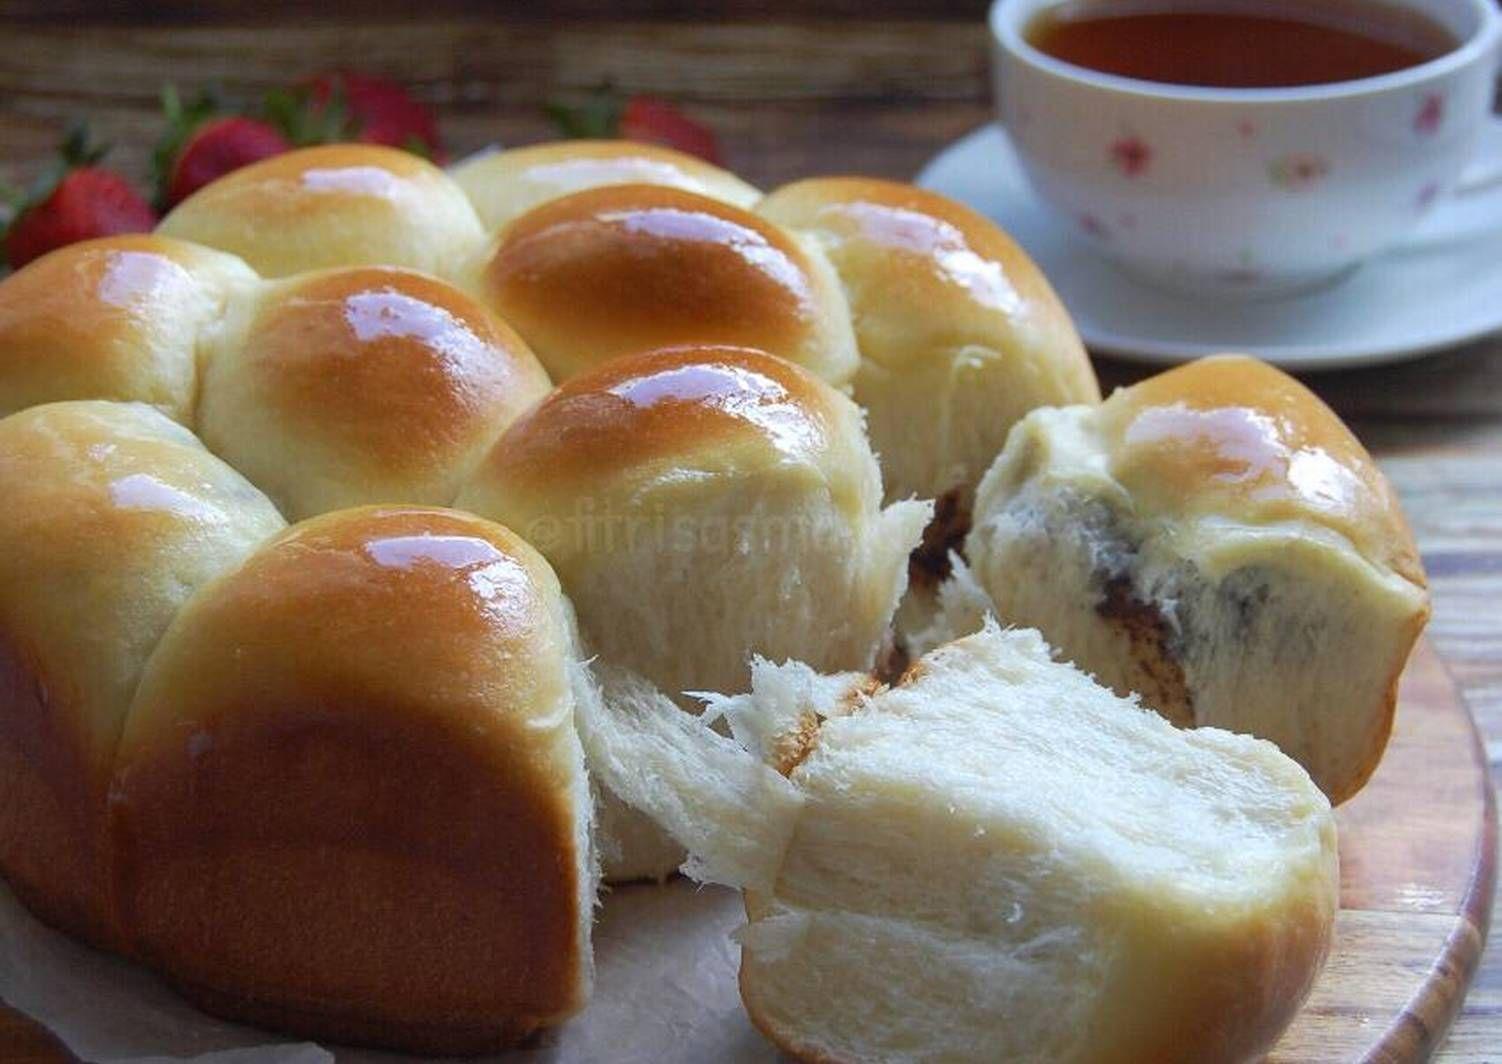 Resep Roti Sobek Ekonomis Satu Telur Lembut Oleh Fitri Sasmaya Resep Resep Roti Rotis Resep Makanan